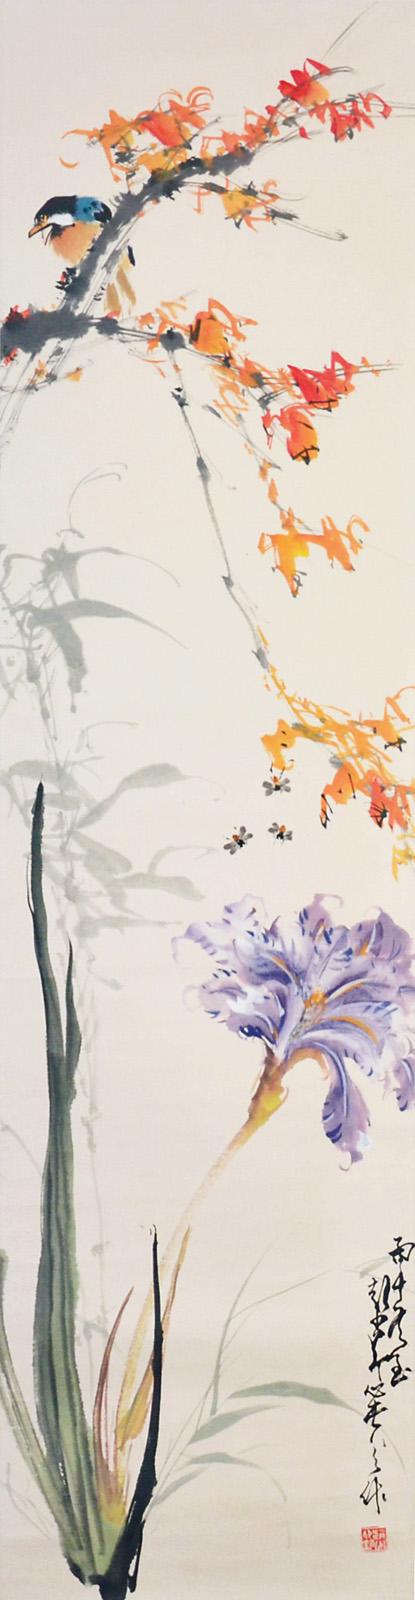 Zhao Shaoang Bird on Maple 赵少昂 (1905 - 1998) 枫红花紫鸟鸣图